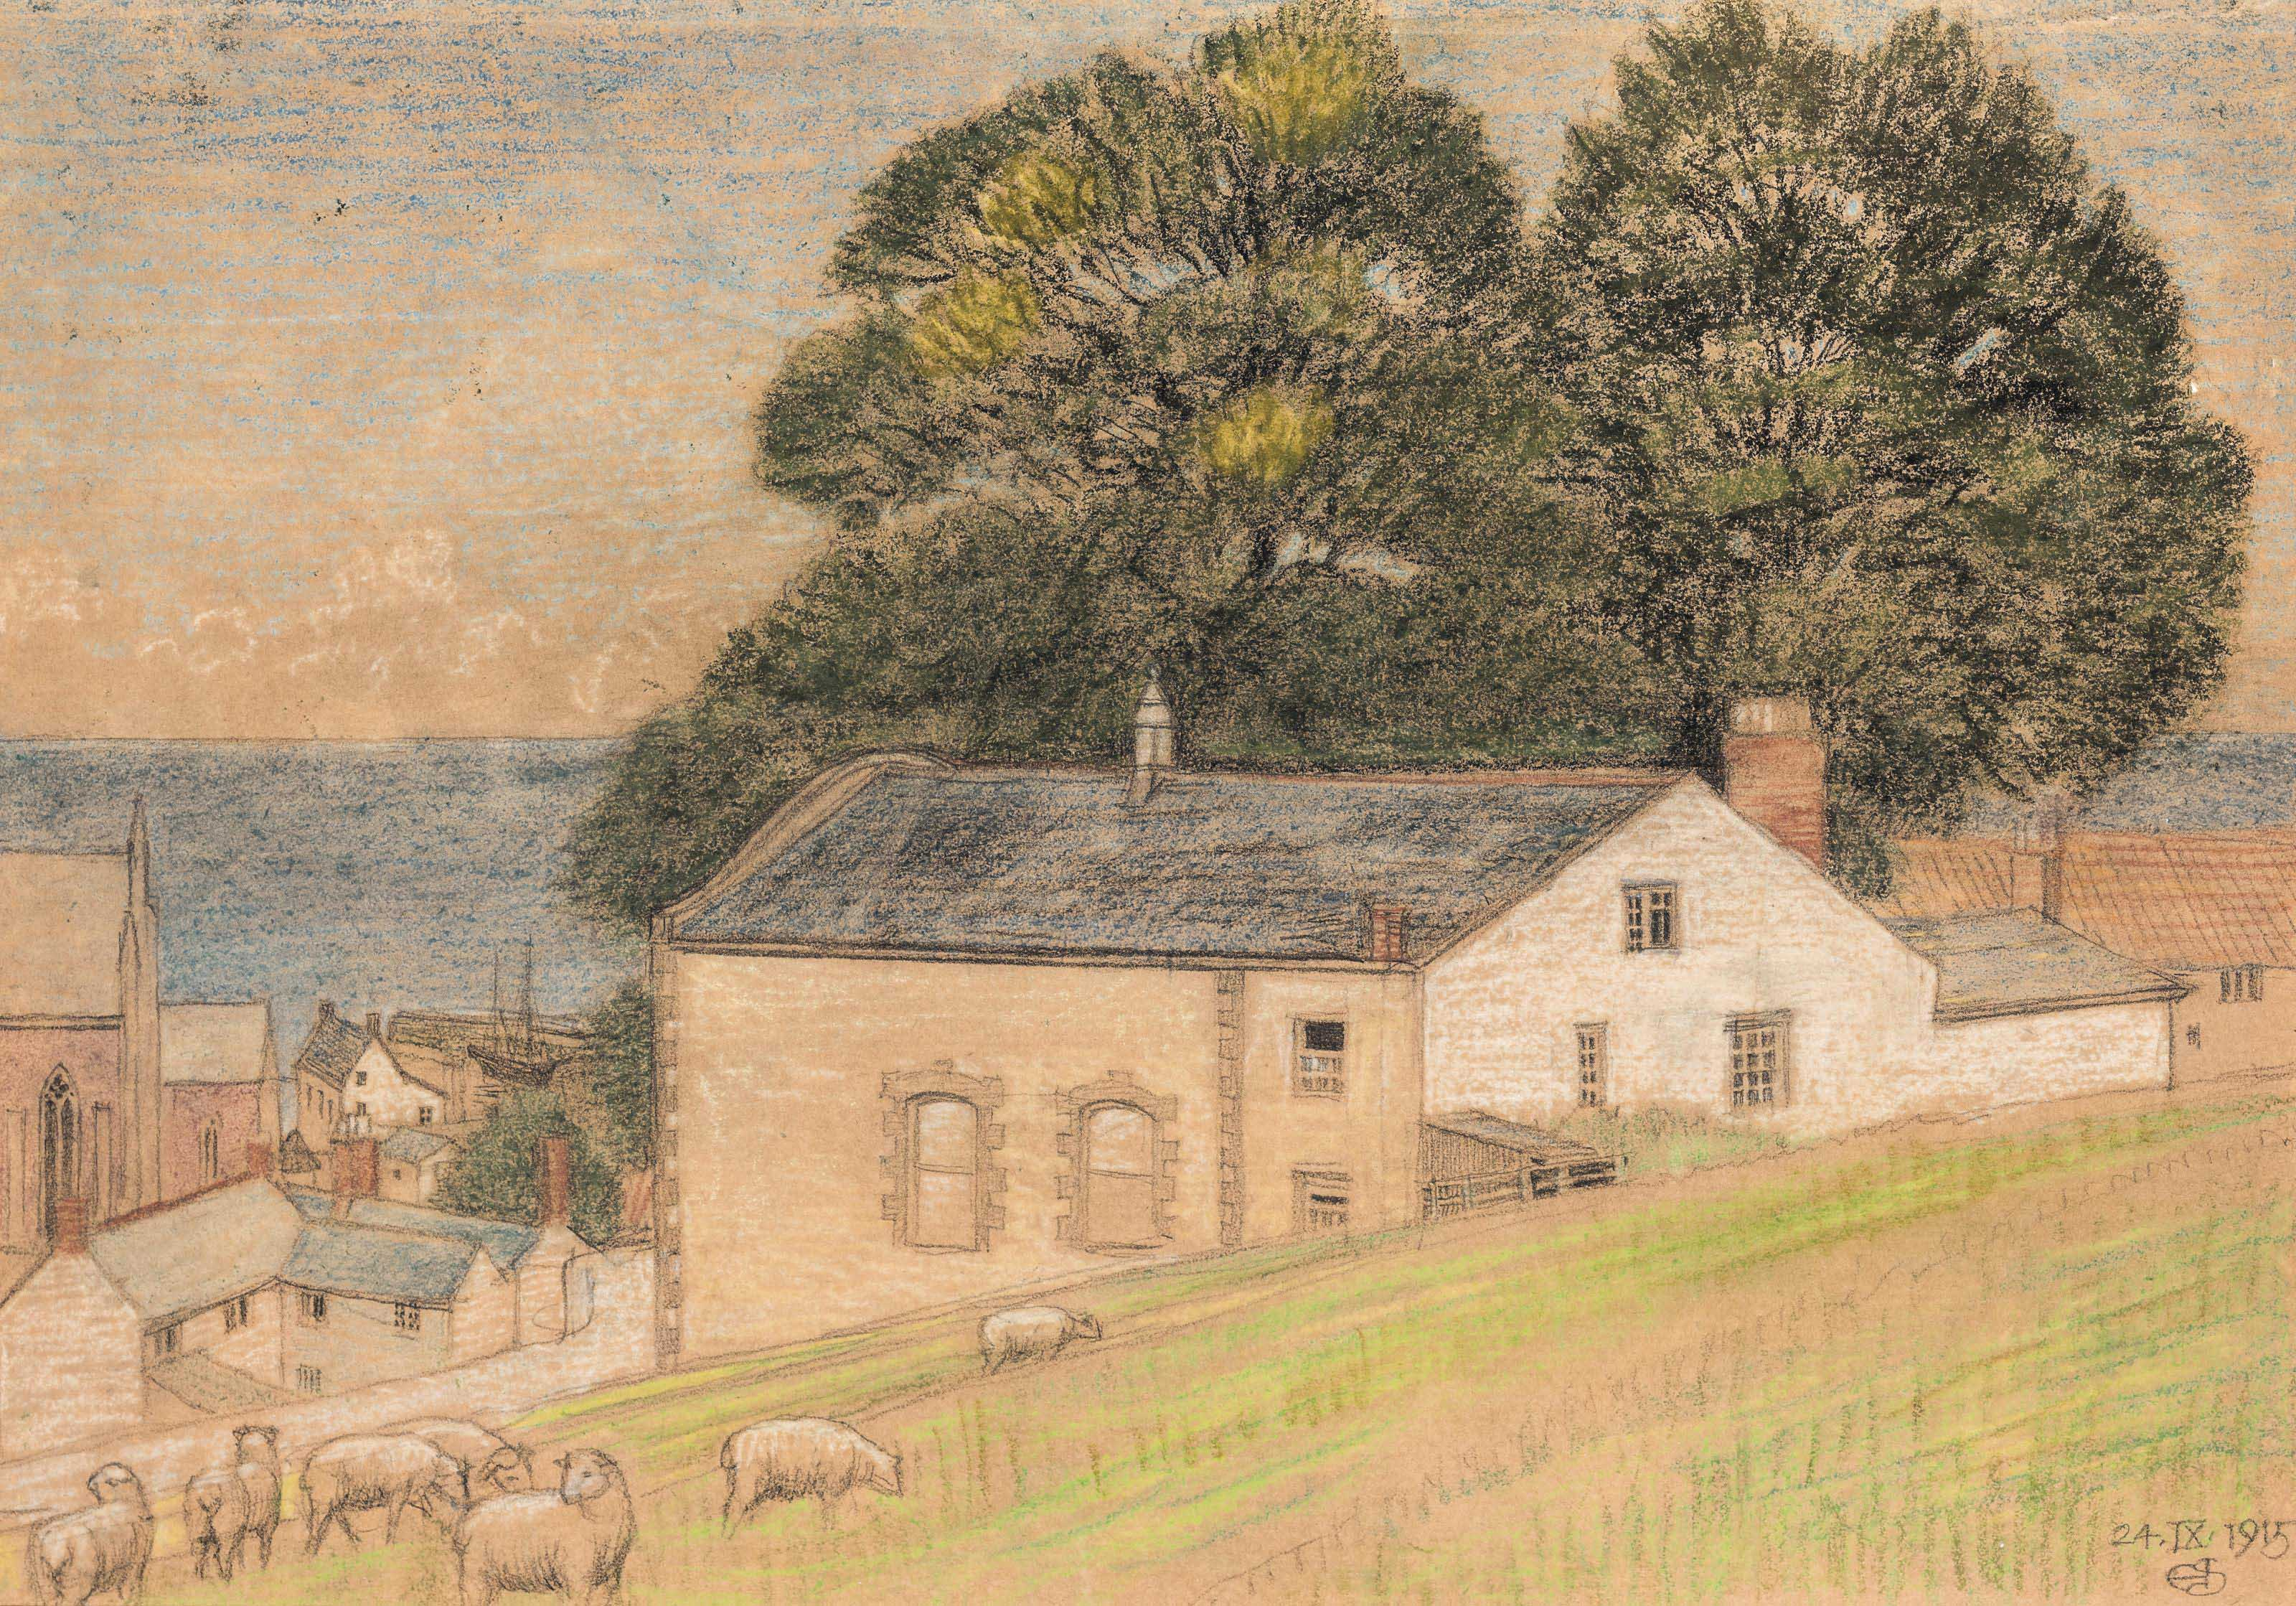 Grazing sheep, Watchet, Somerset